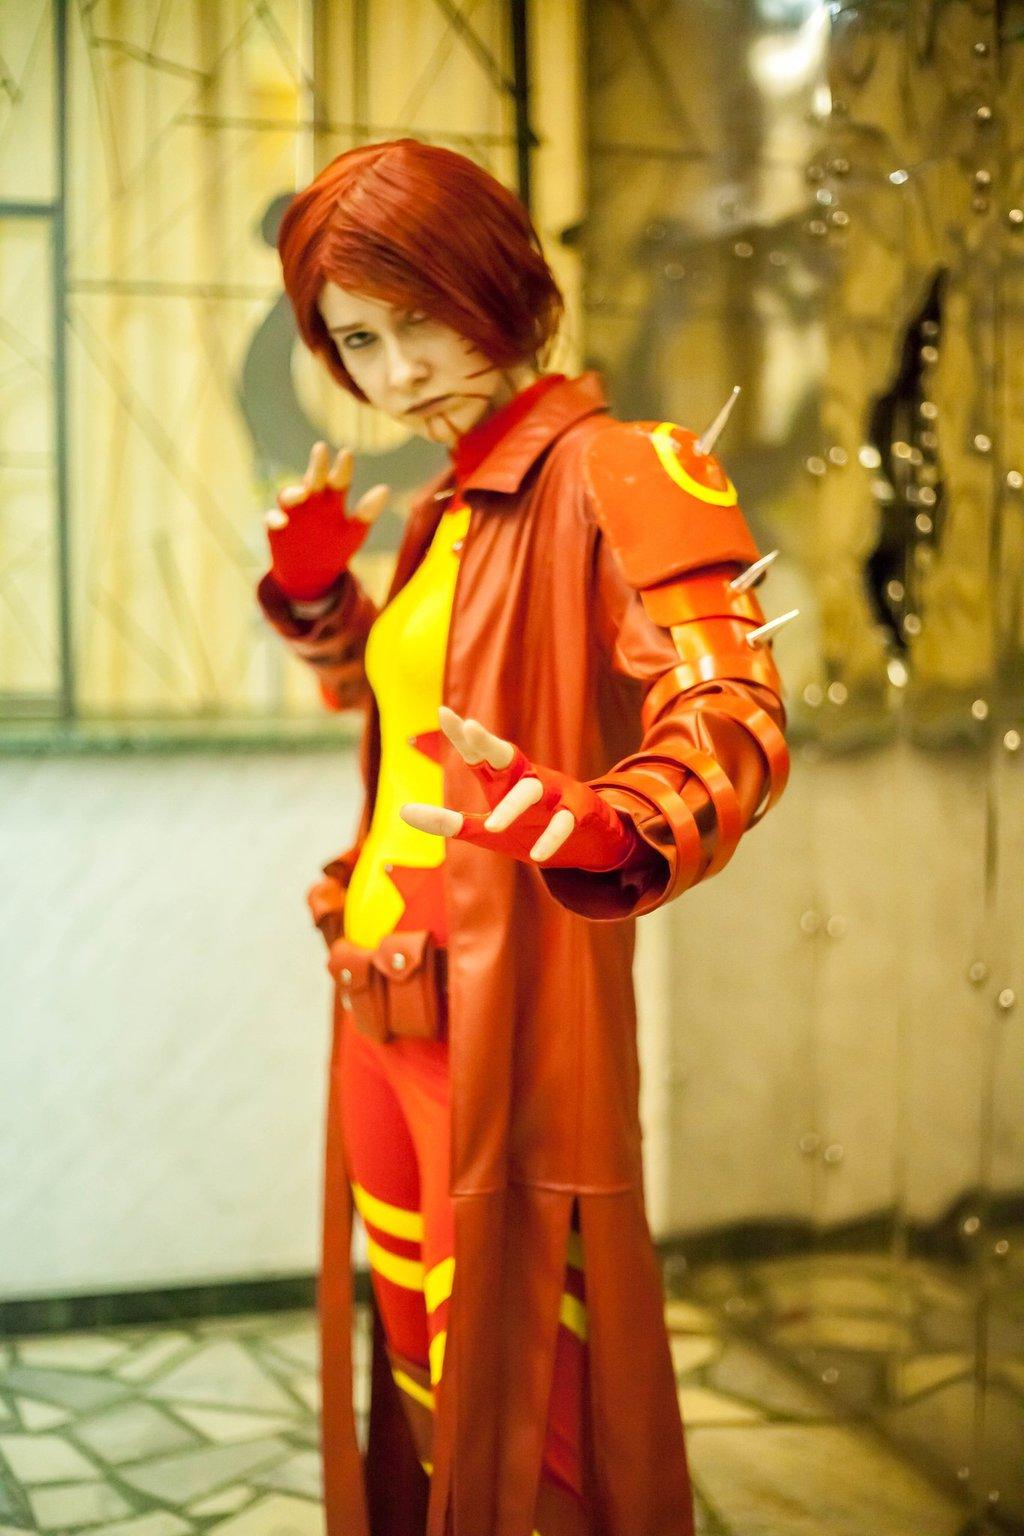 rachel_grey_cosplay_5_by_shiera13-d7m6277